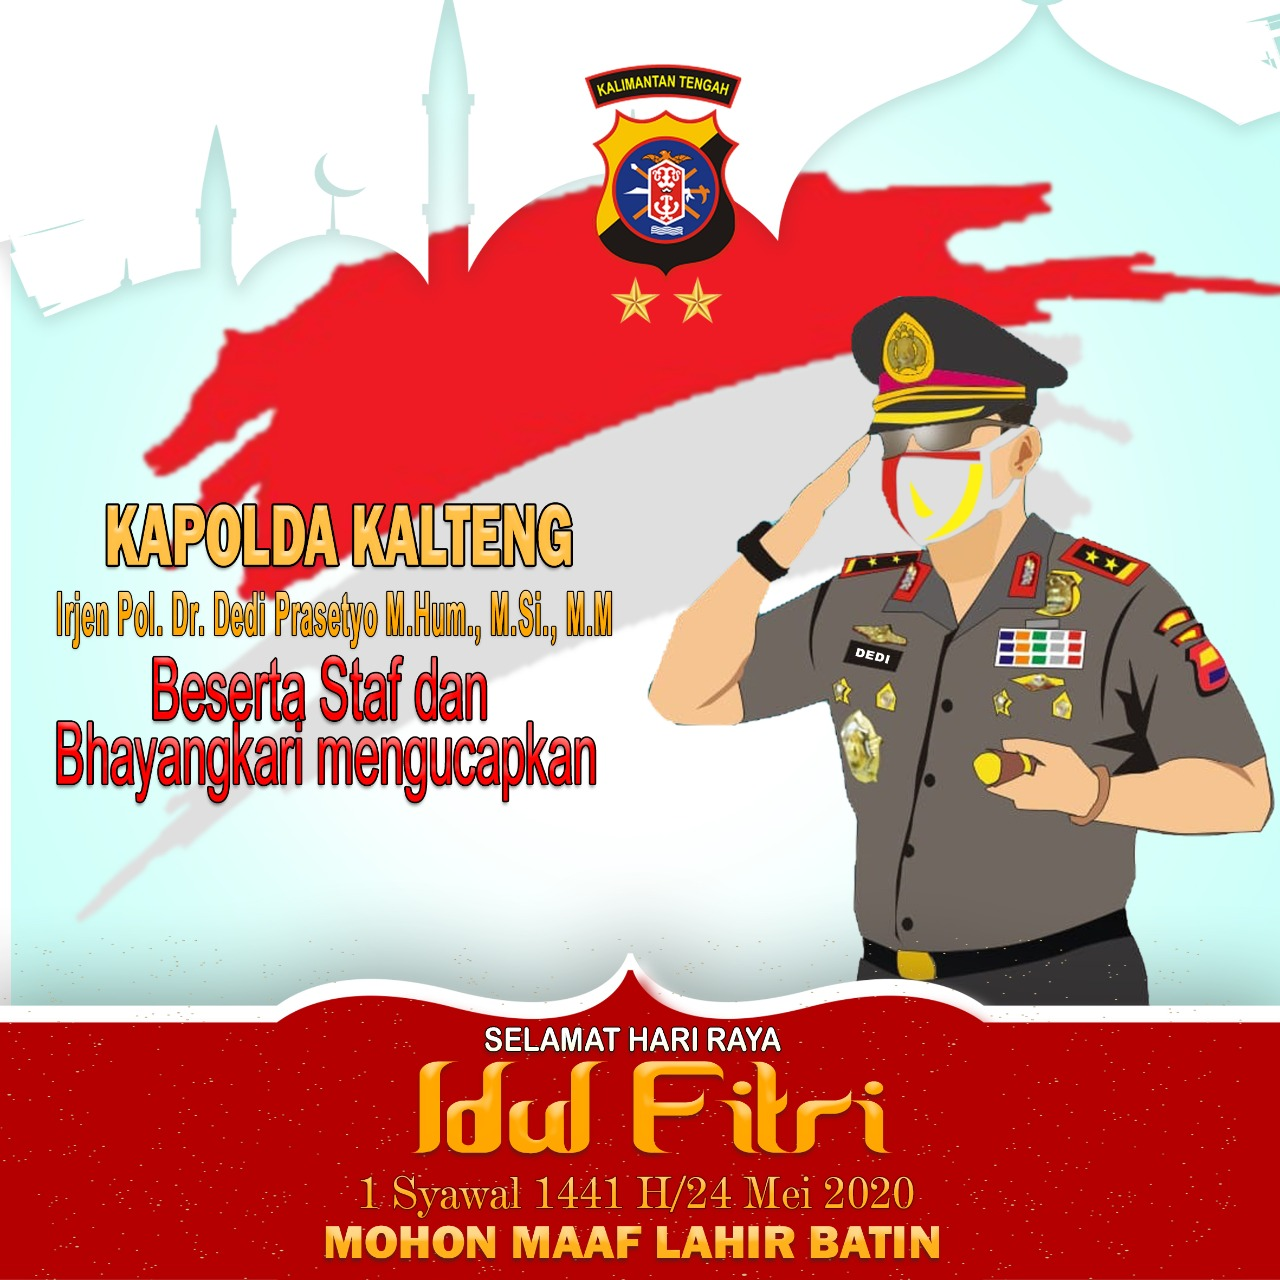 Ucapan Selamat Idul Fitri Kapolda Kalteng Irjen Pol Deddy Prasetyo